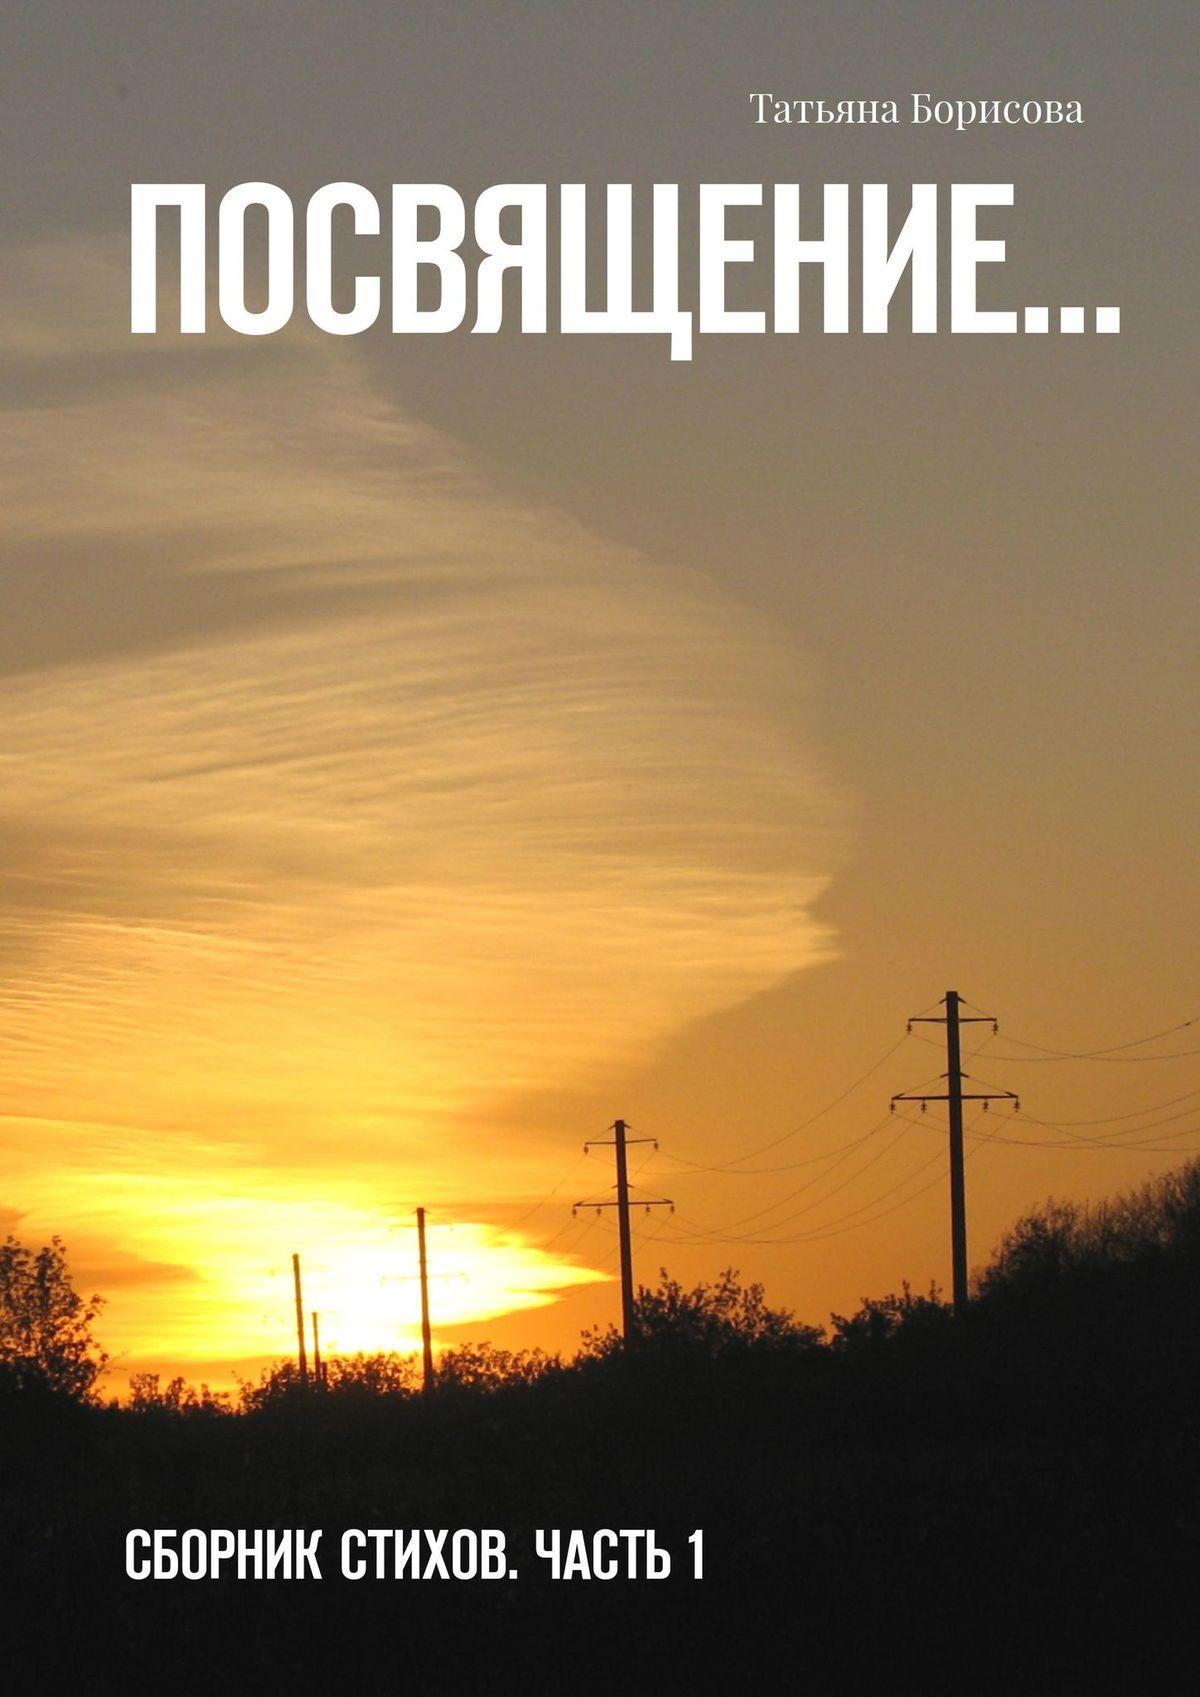 Татьяна Николаевна Борисова Посвящение… Сборник стихов татьяна булатова счастливо оставаться сборник